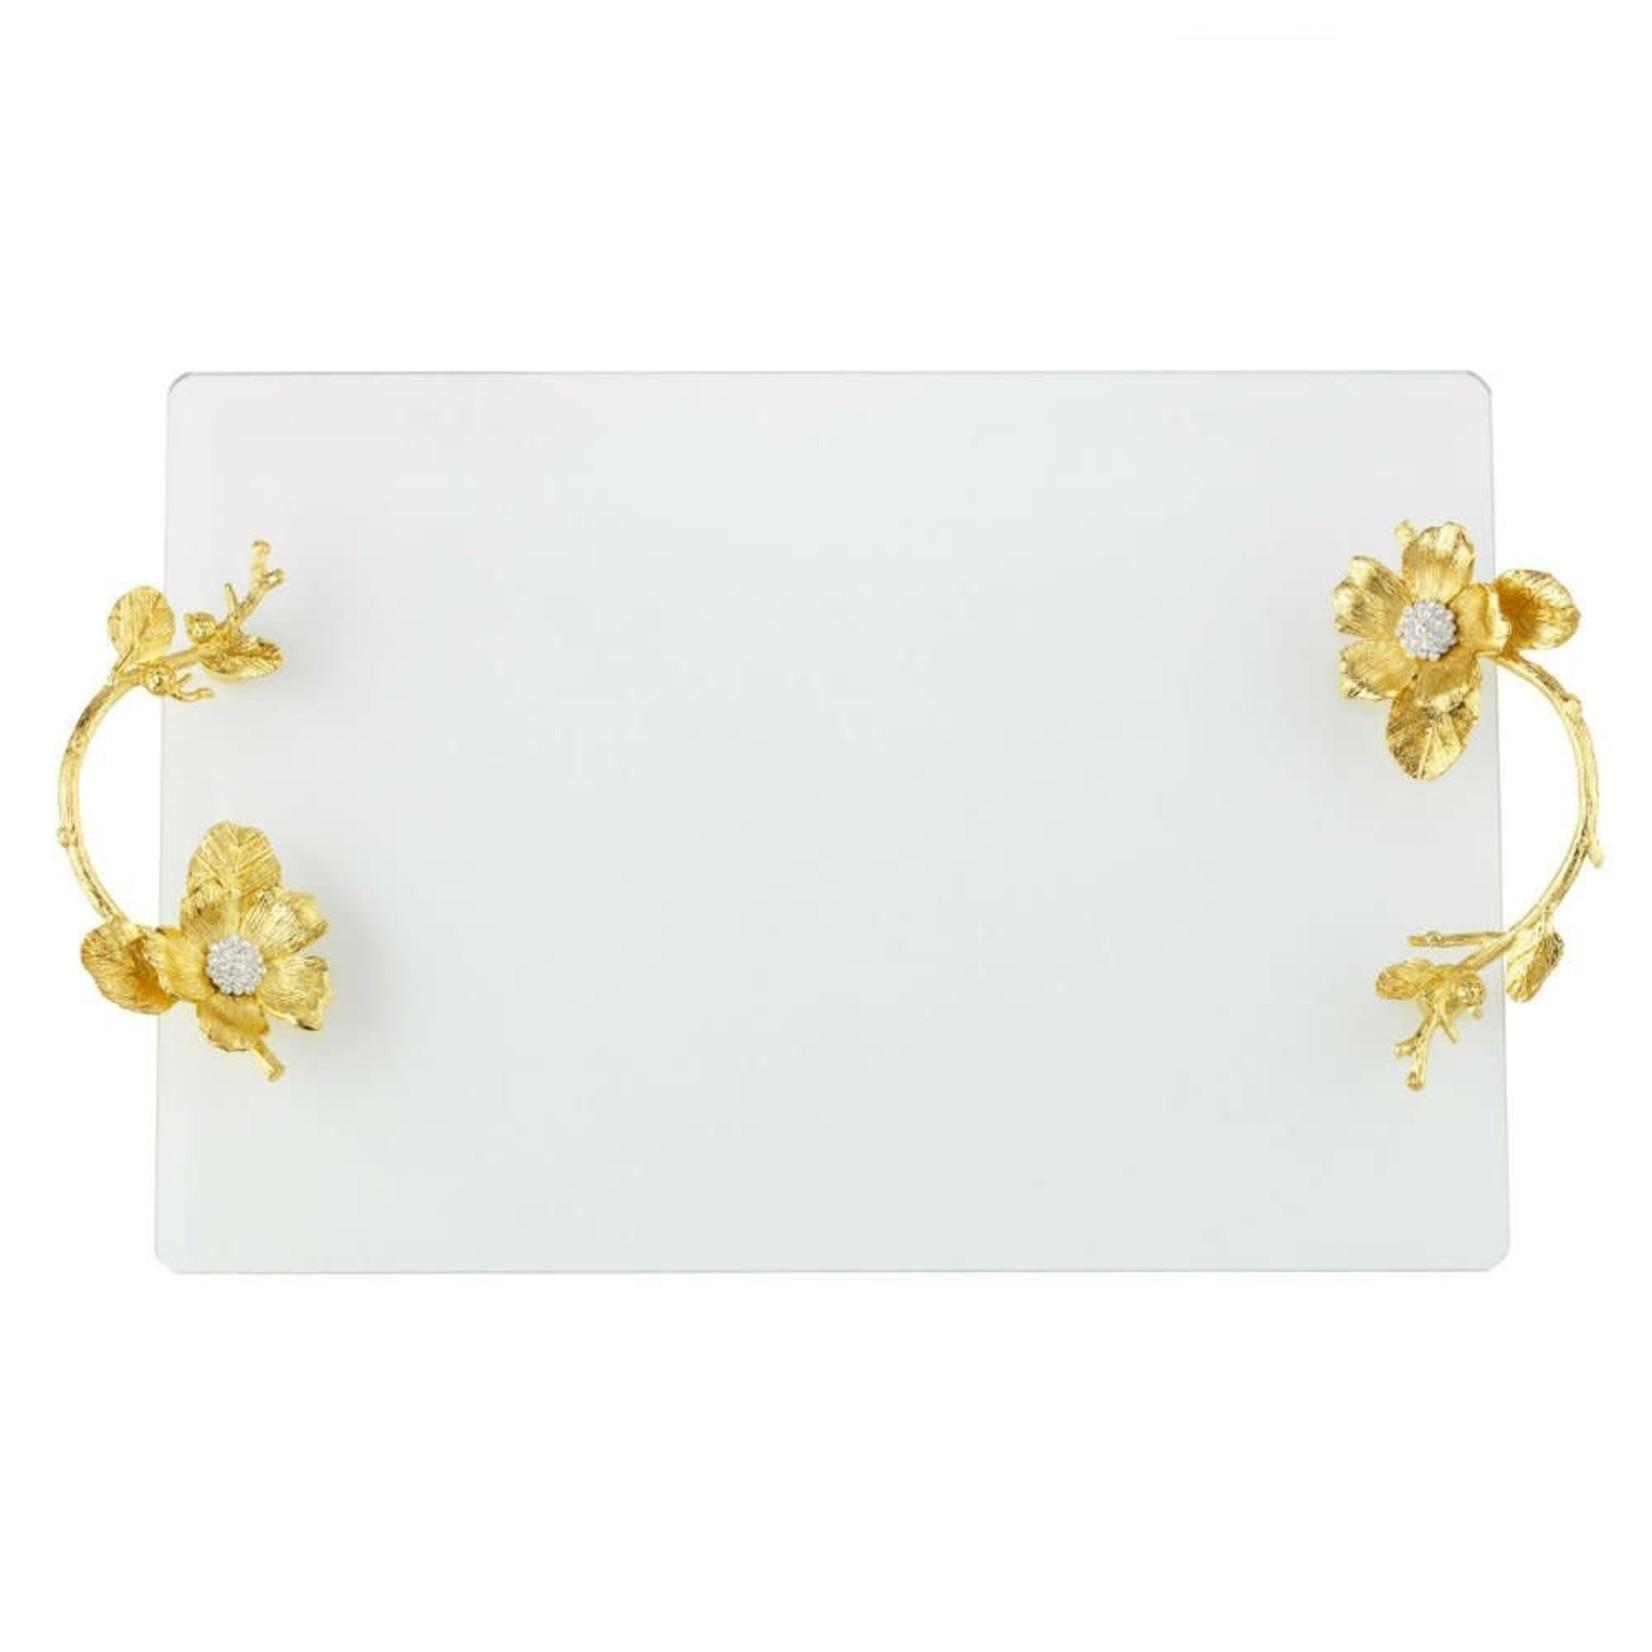 Olivia Riegel Gold Botanica Glass Tray